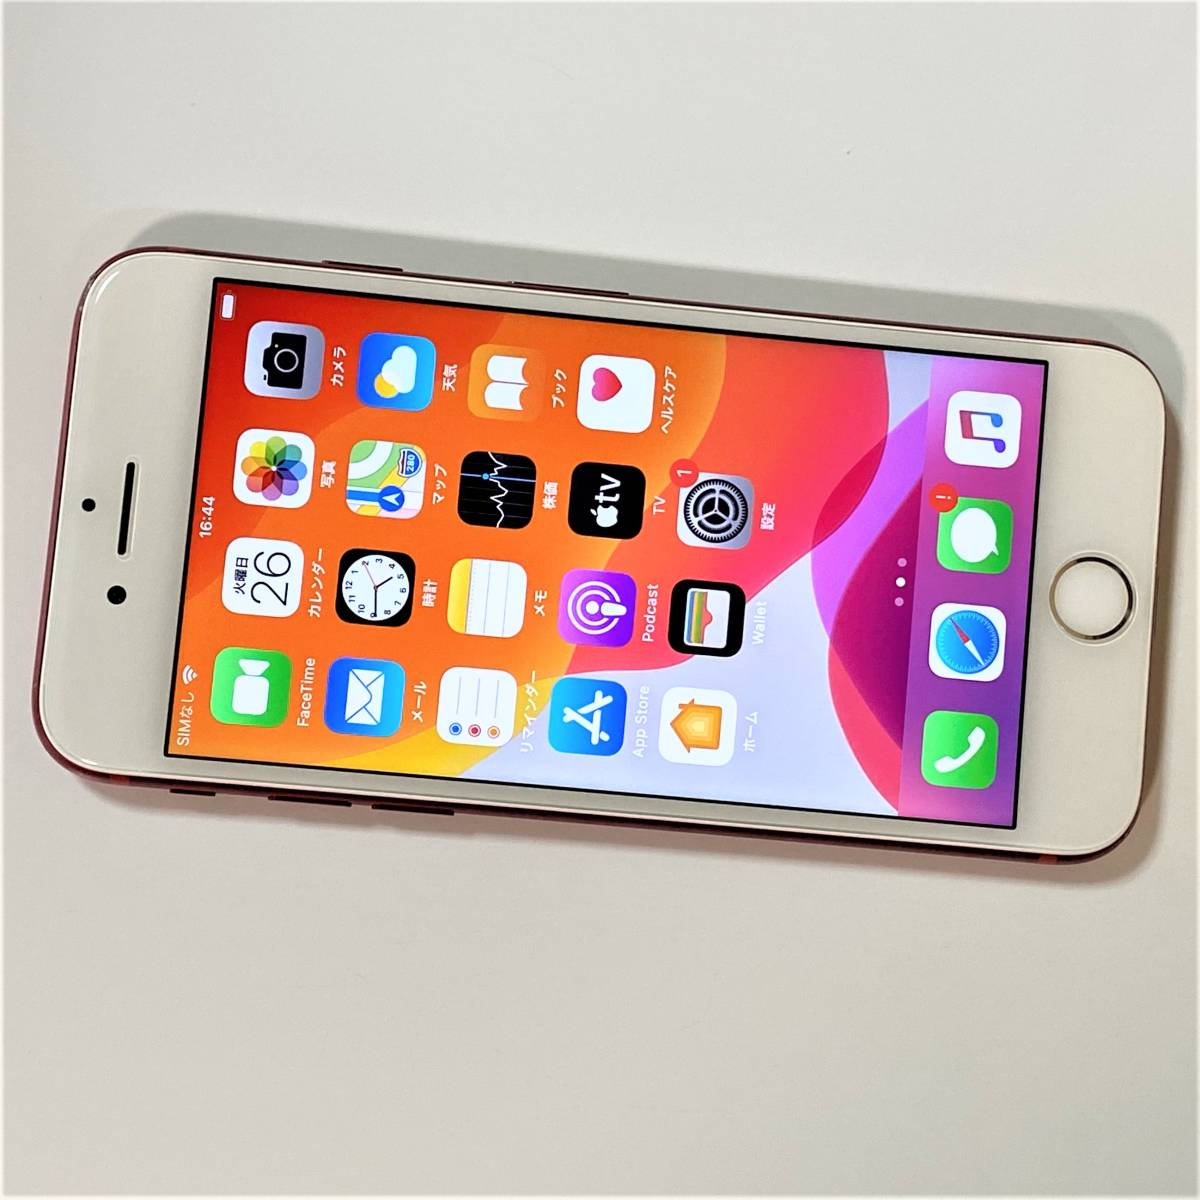 SIMフリー iPhone 7 (PRODUCT)RED 128GB MPRX2J/A バッテリー最大容量100% docomo 格安SIM MVNO 海外可 アクティベーションロック解除済